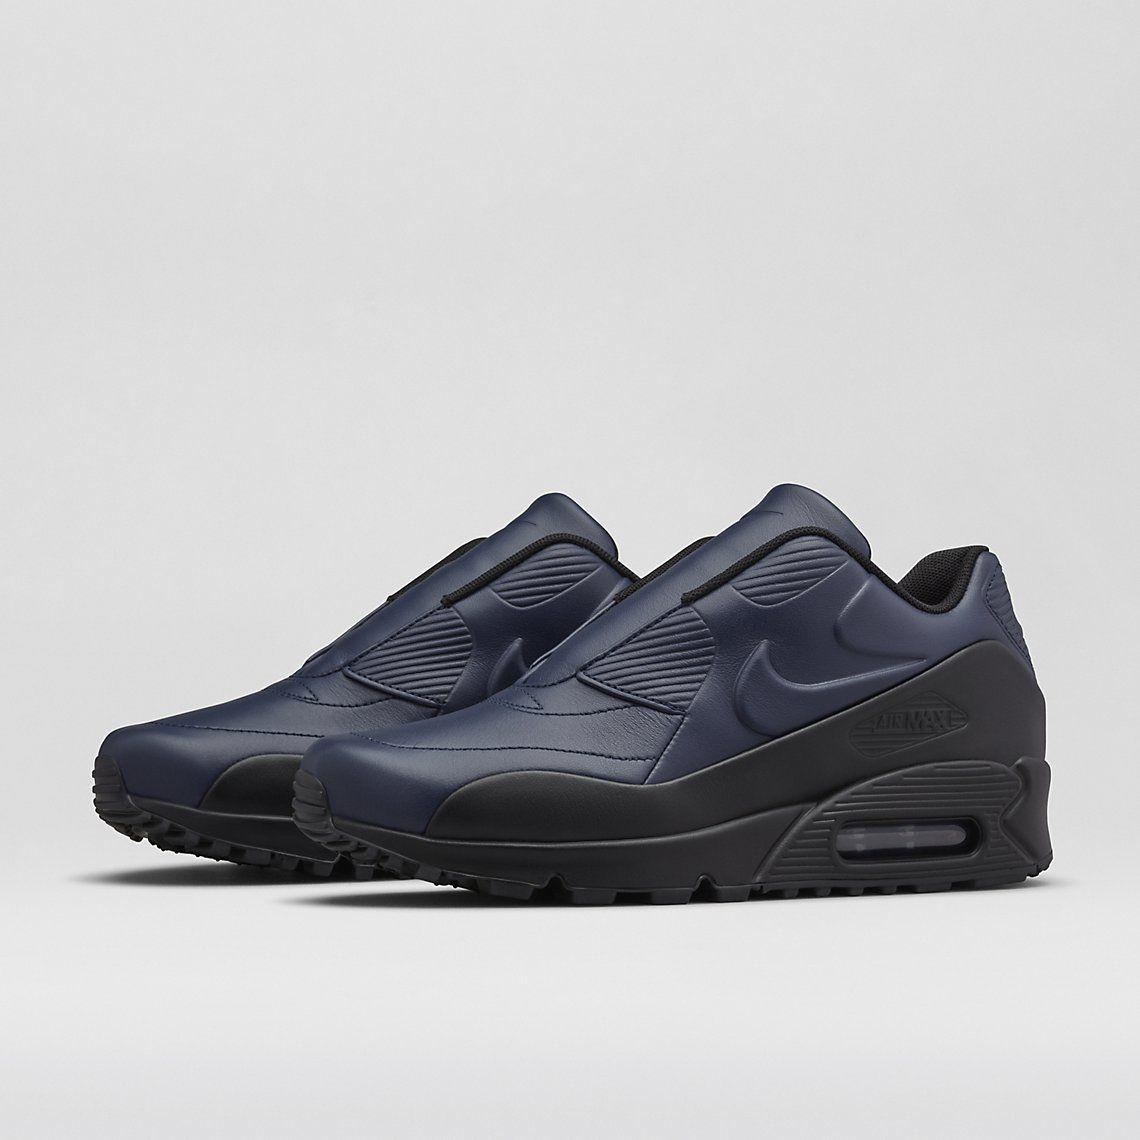 Buty damskie NikeLab x sacai Air Max 90. Nike Store PL